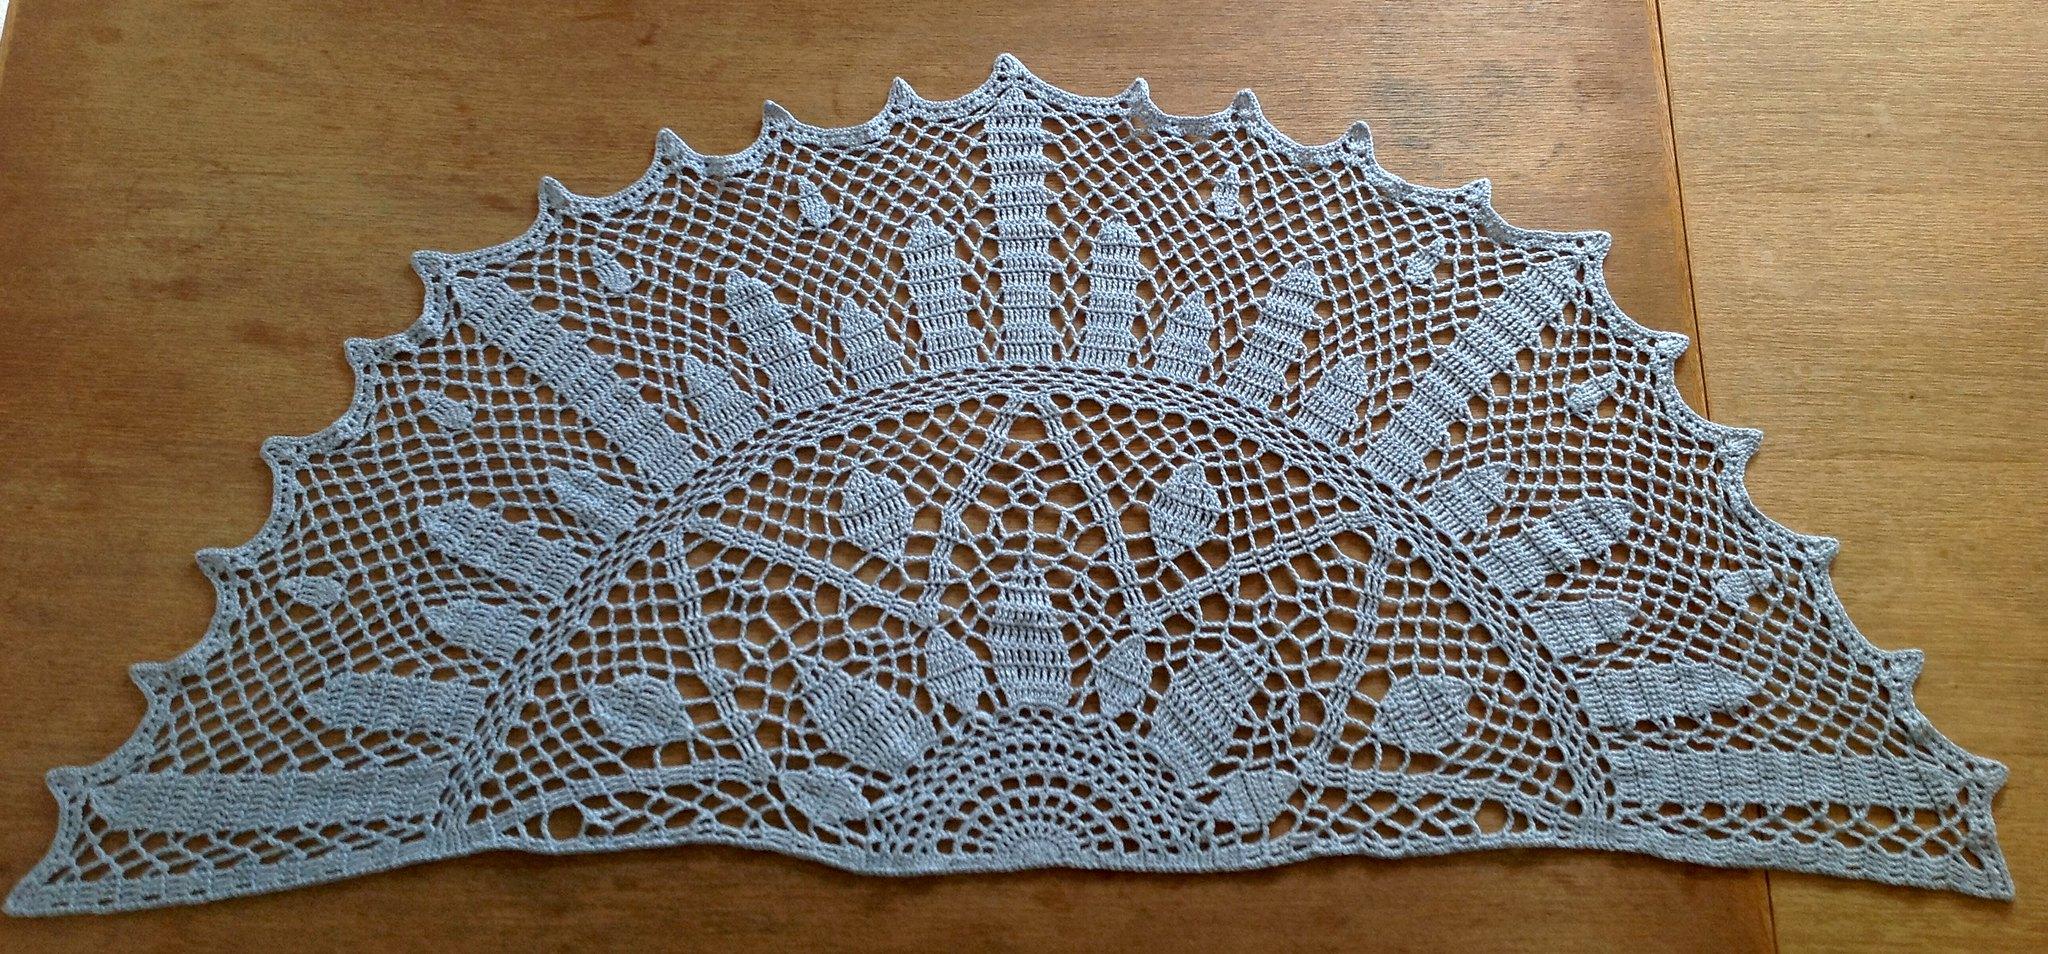 suvi 39 s crochet art deco sunburst shawl. Black Bedroom Furniture Sets. Home Design Ideas